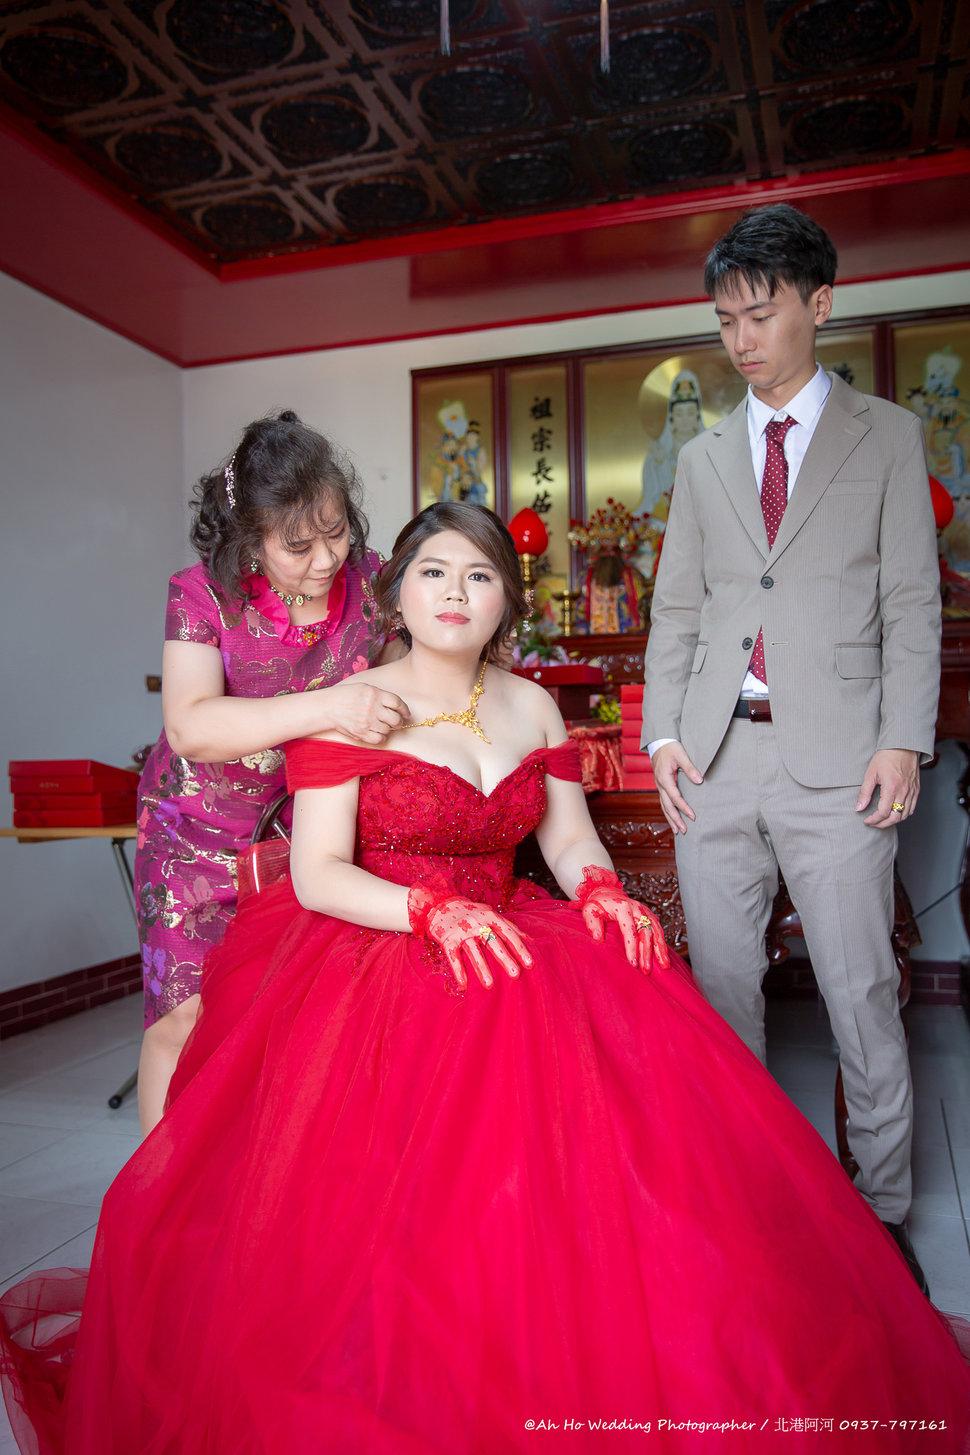 AhHo Wedding TEL-0937797161 lineID-chiupeiho-91 - 北港阿河婚攝 AhHoWedding - 結婚吧